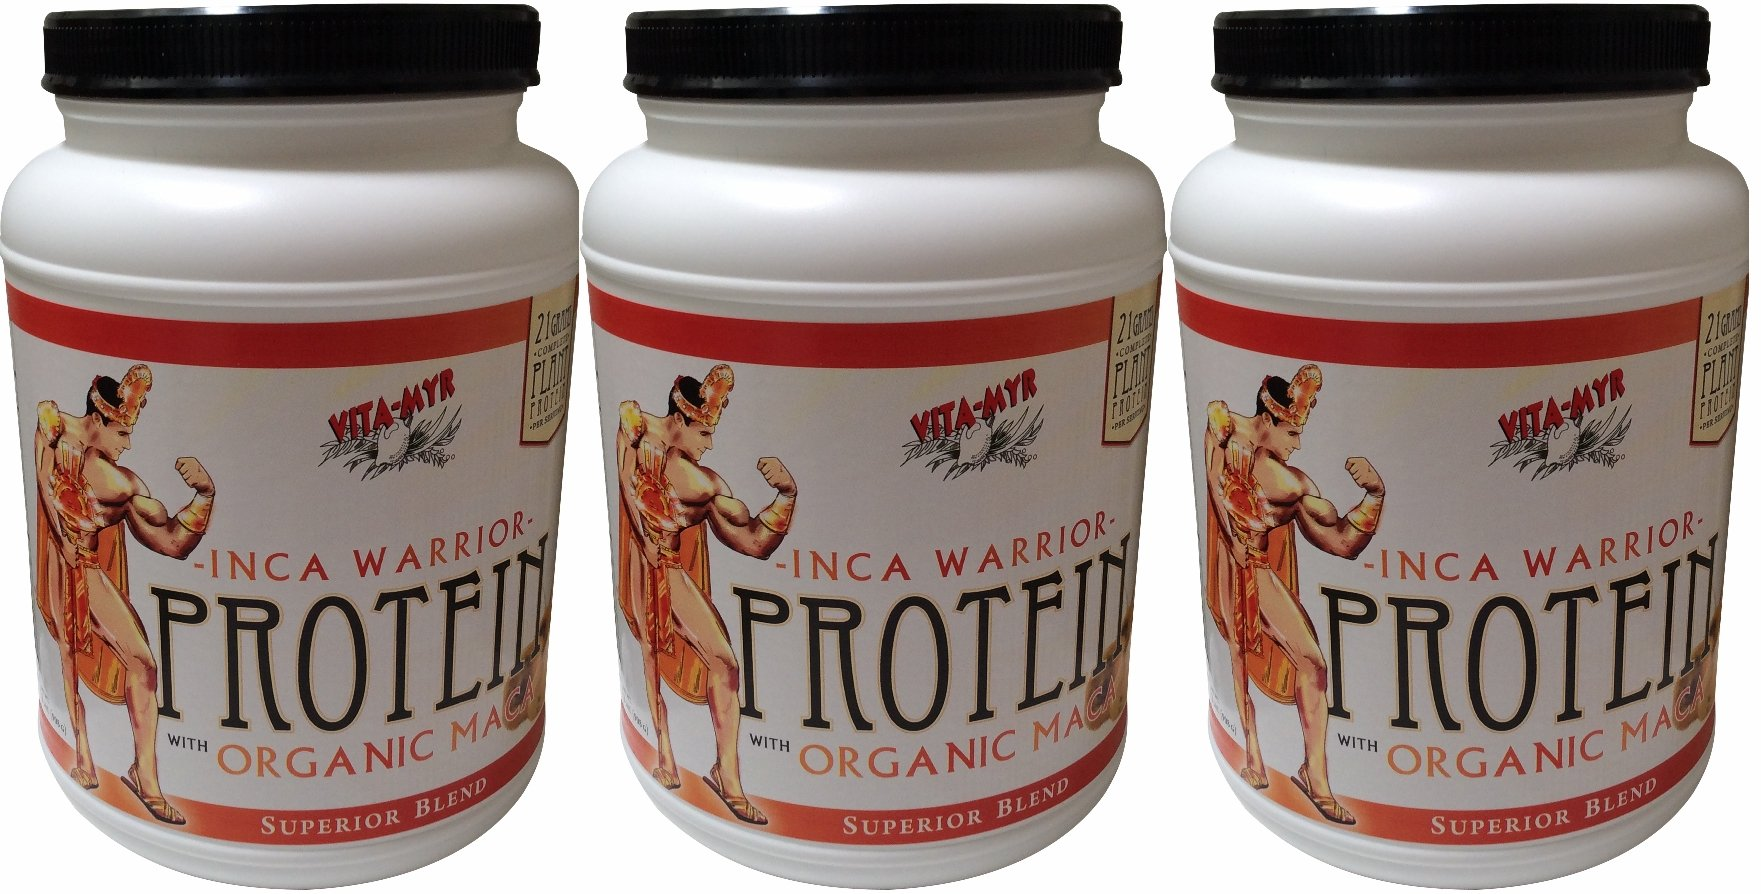 3 Pack (3 Month Supply) Vanilla INCA WARRIOR PROTEIN w/Organic Maca 2 Lb. by VITA-MYR